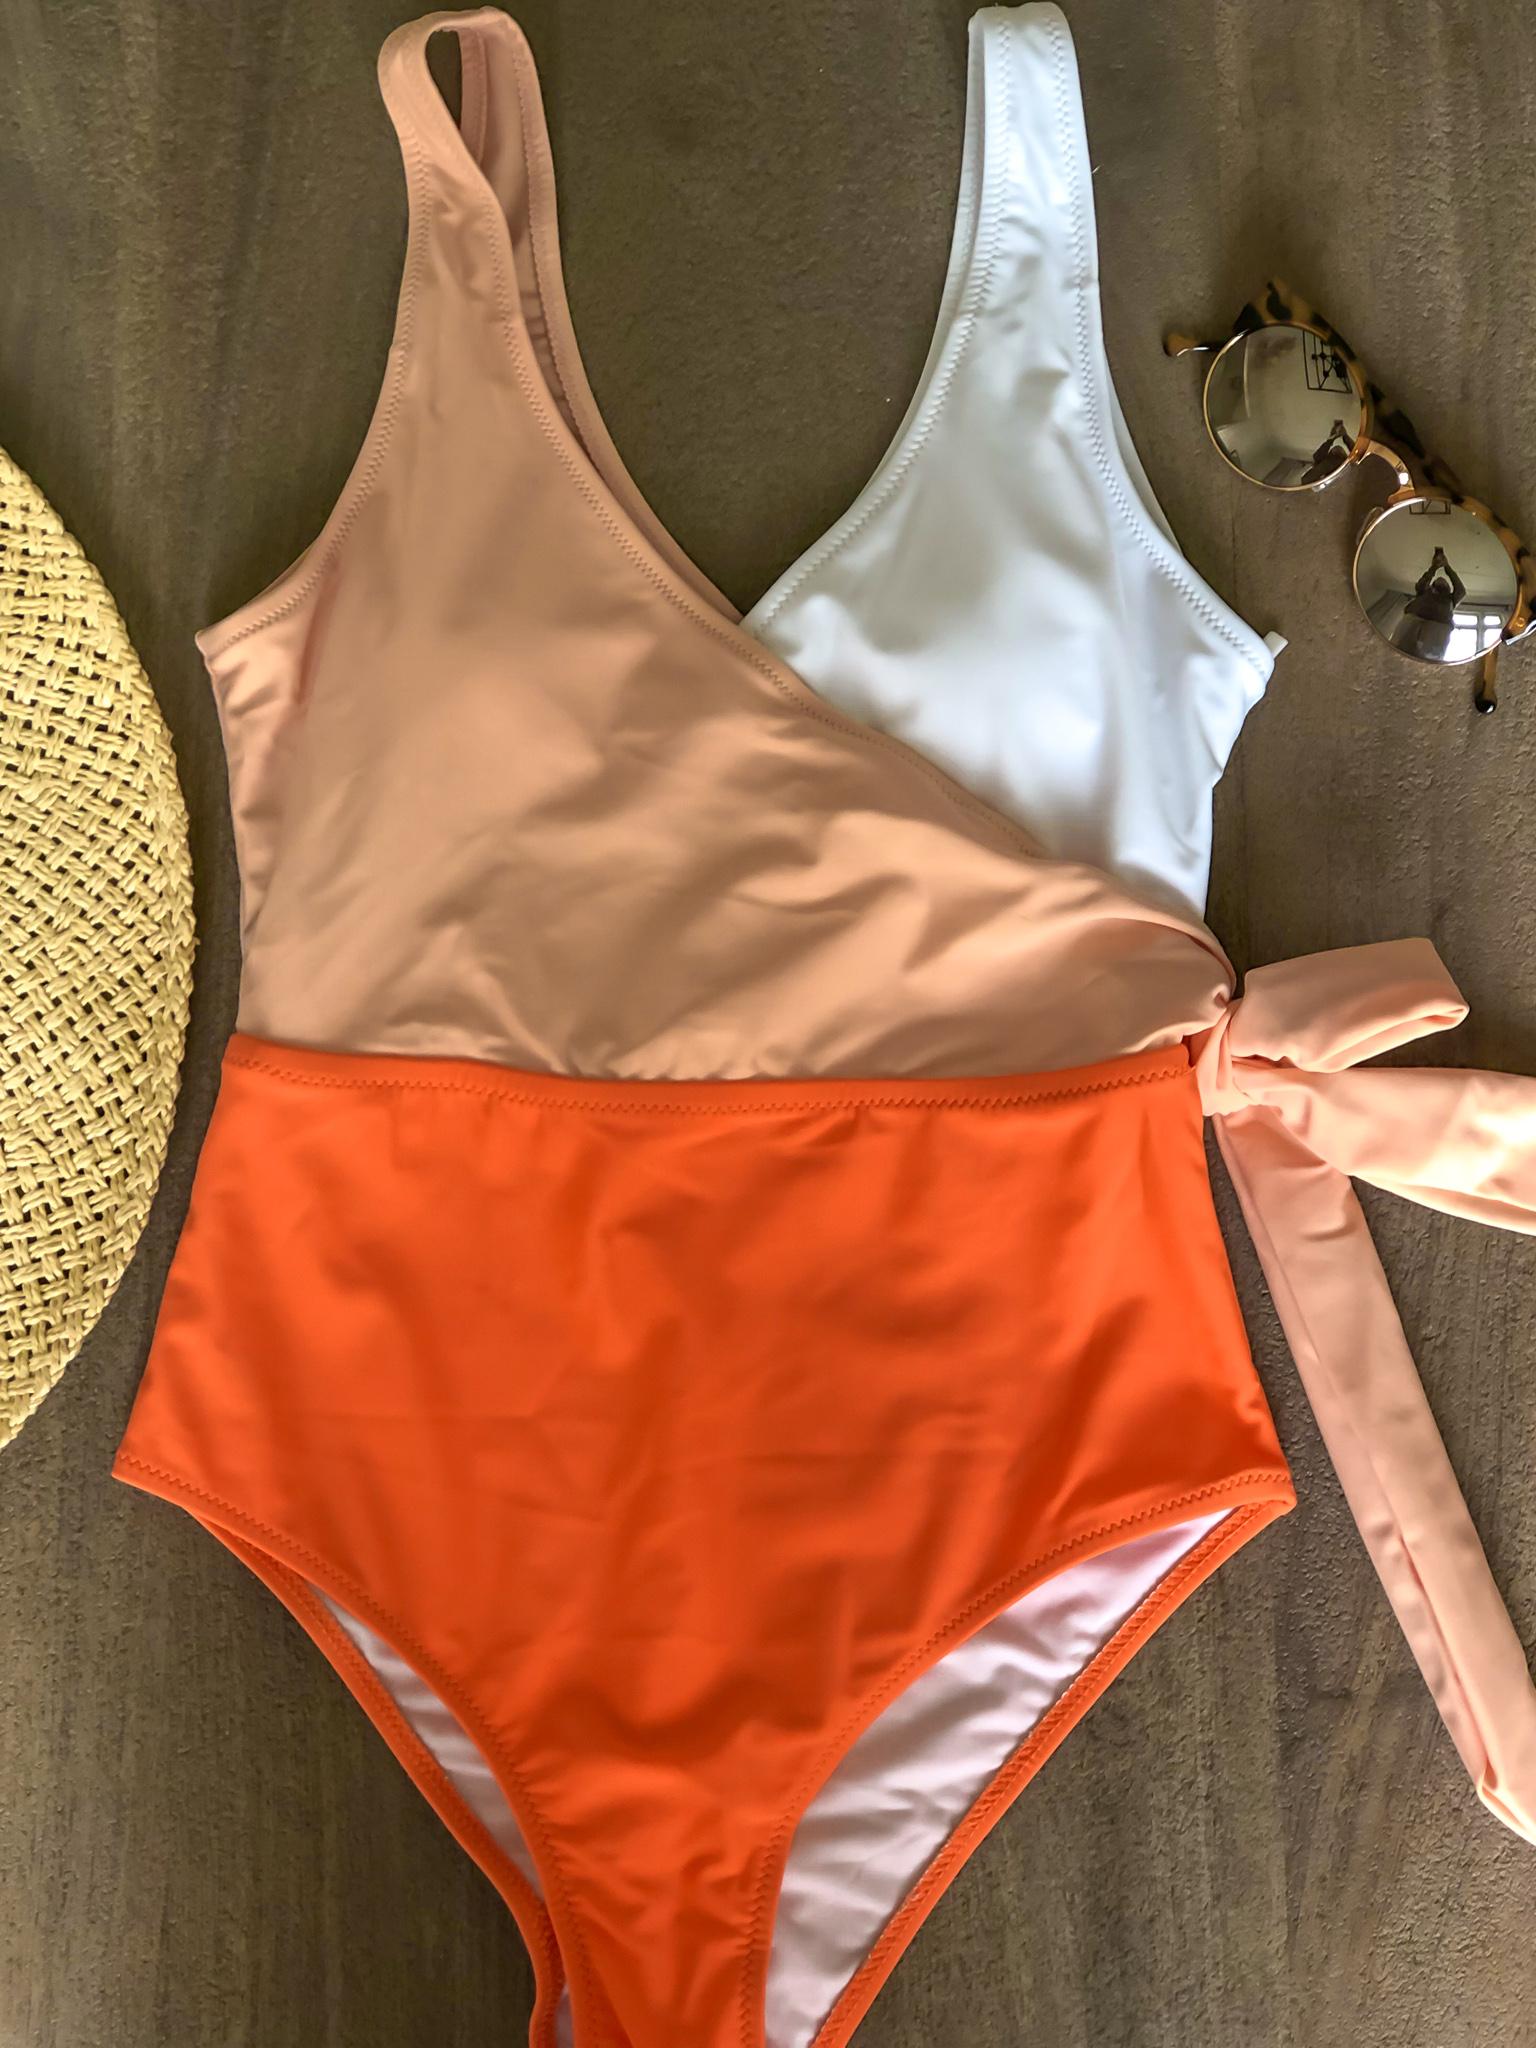 Amazon Swim Round-Up (One Piece Suits & Bikinis)